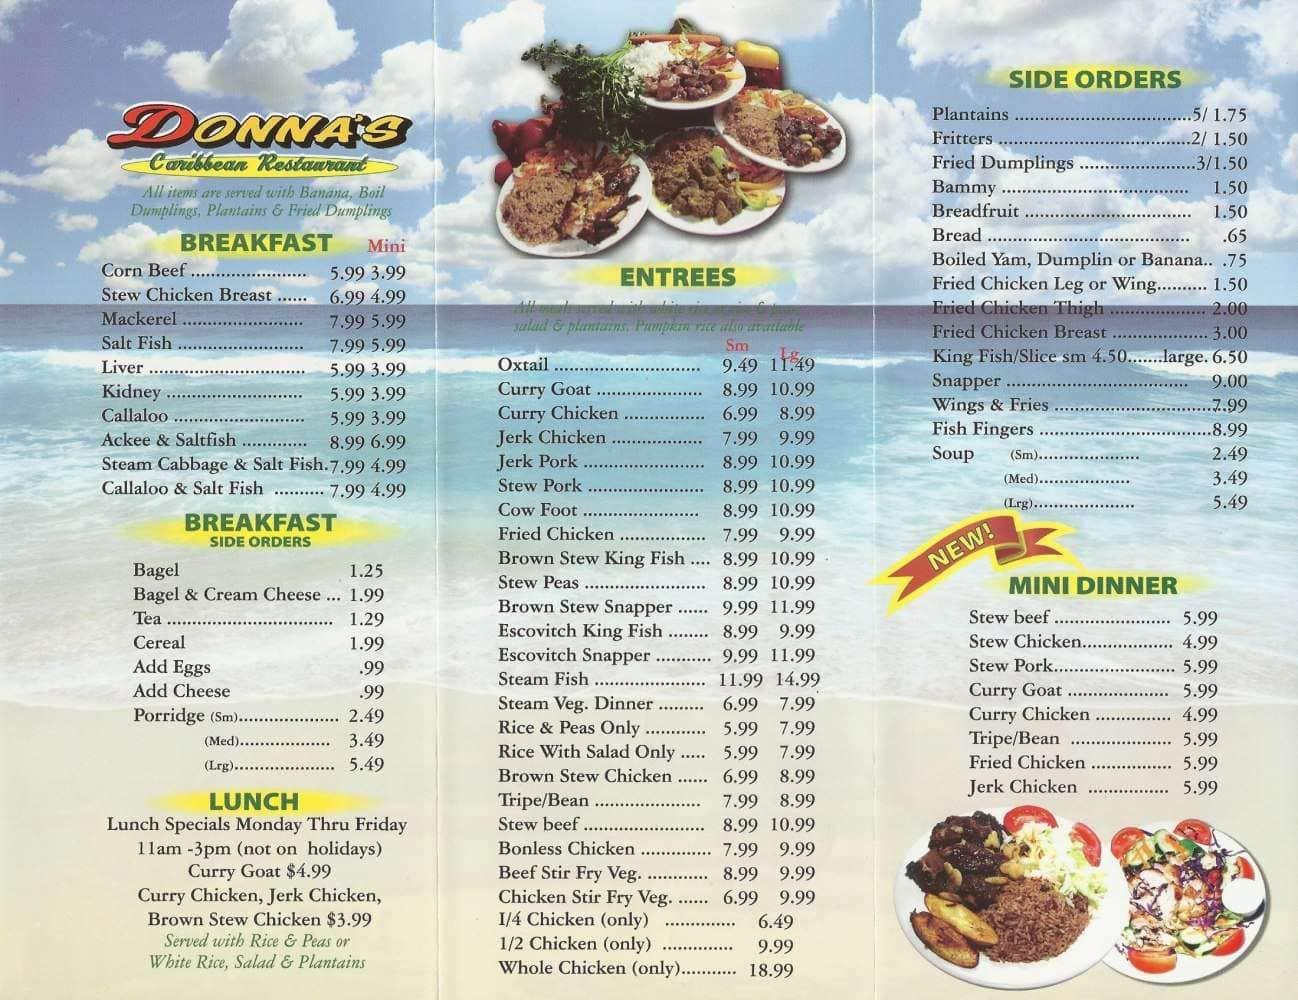 donna 39 s caribbean restaurant menu urbanspoon zomato. Black Bedroom Furniture Sets. Home Design Ideas